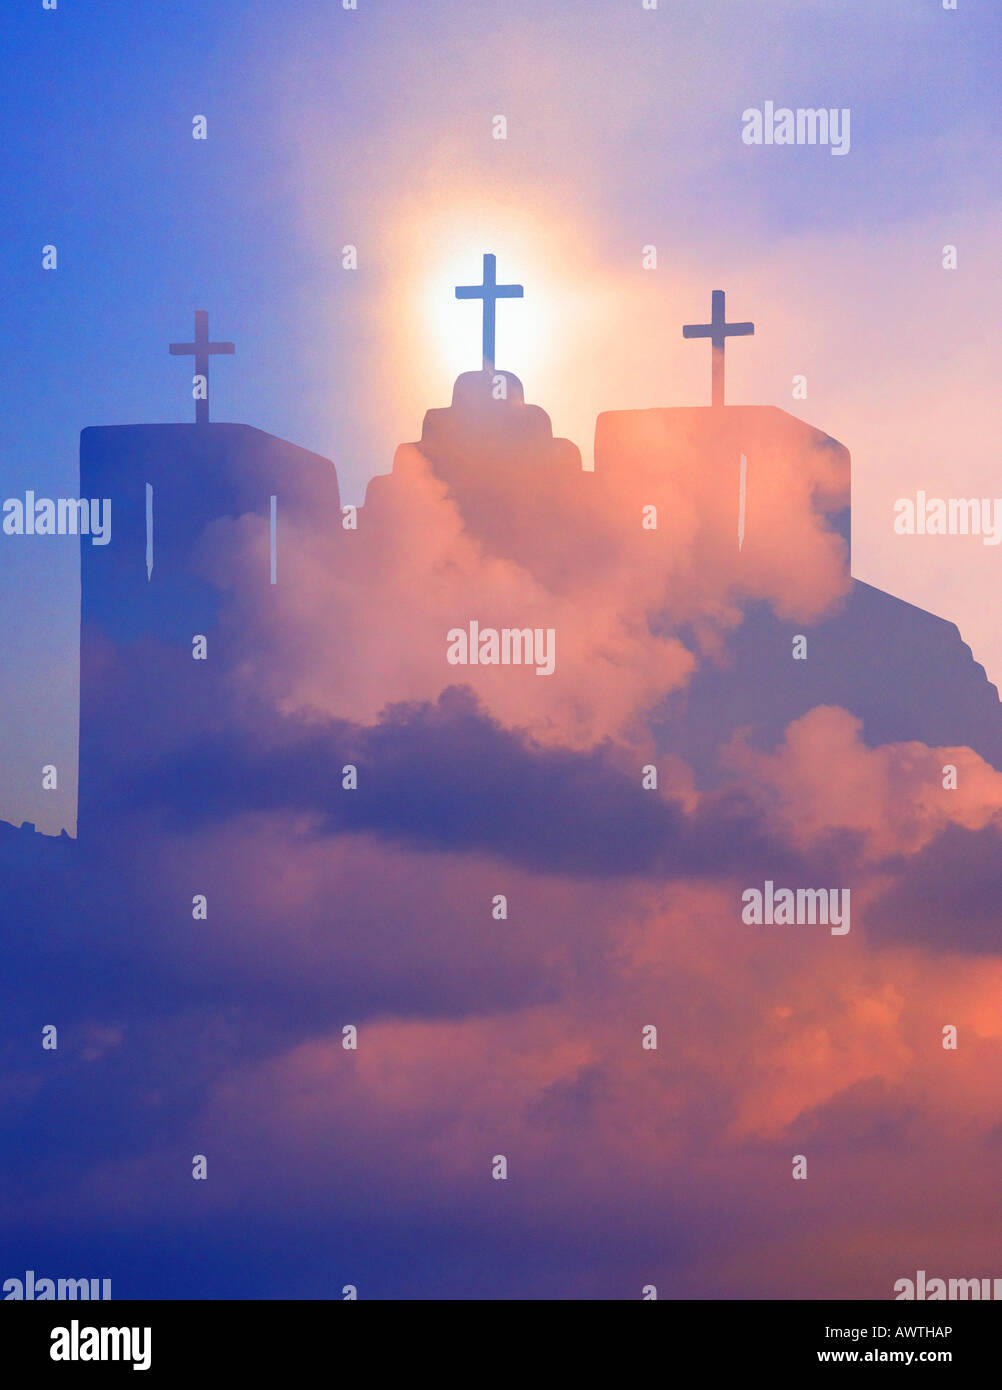 Kirche mit drei kreuzen, New Mexico Stockbild